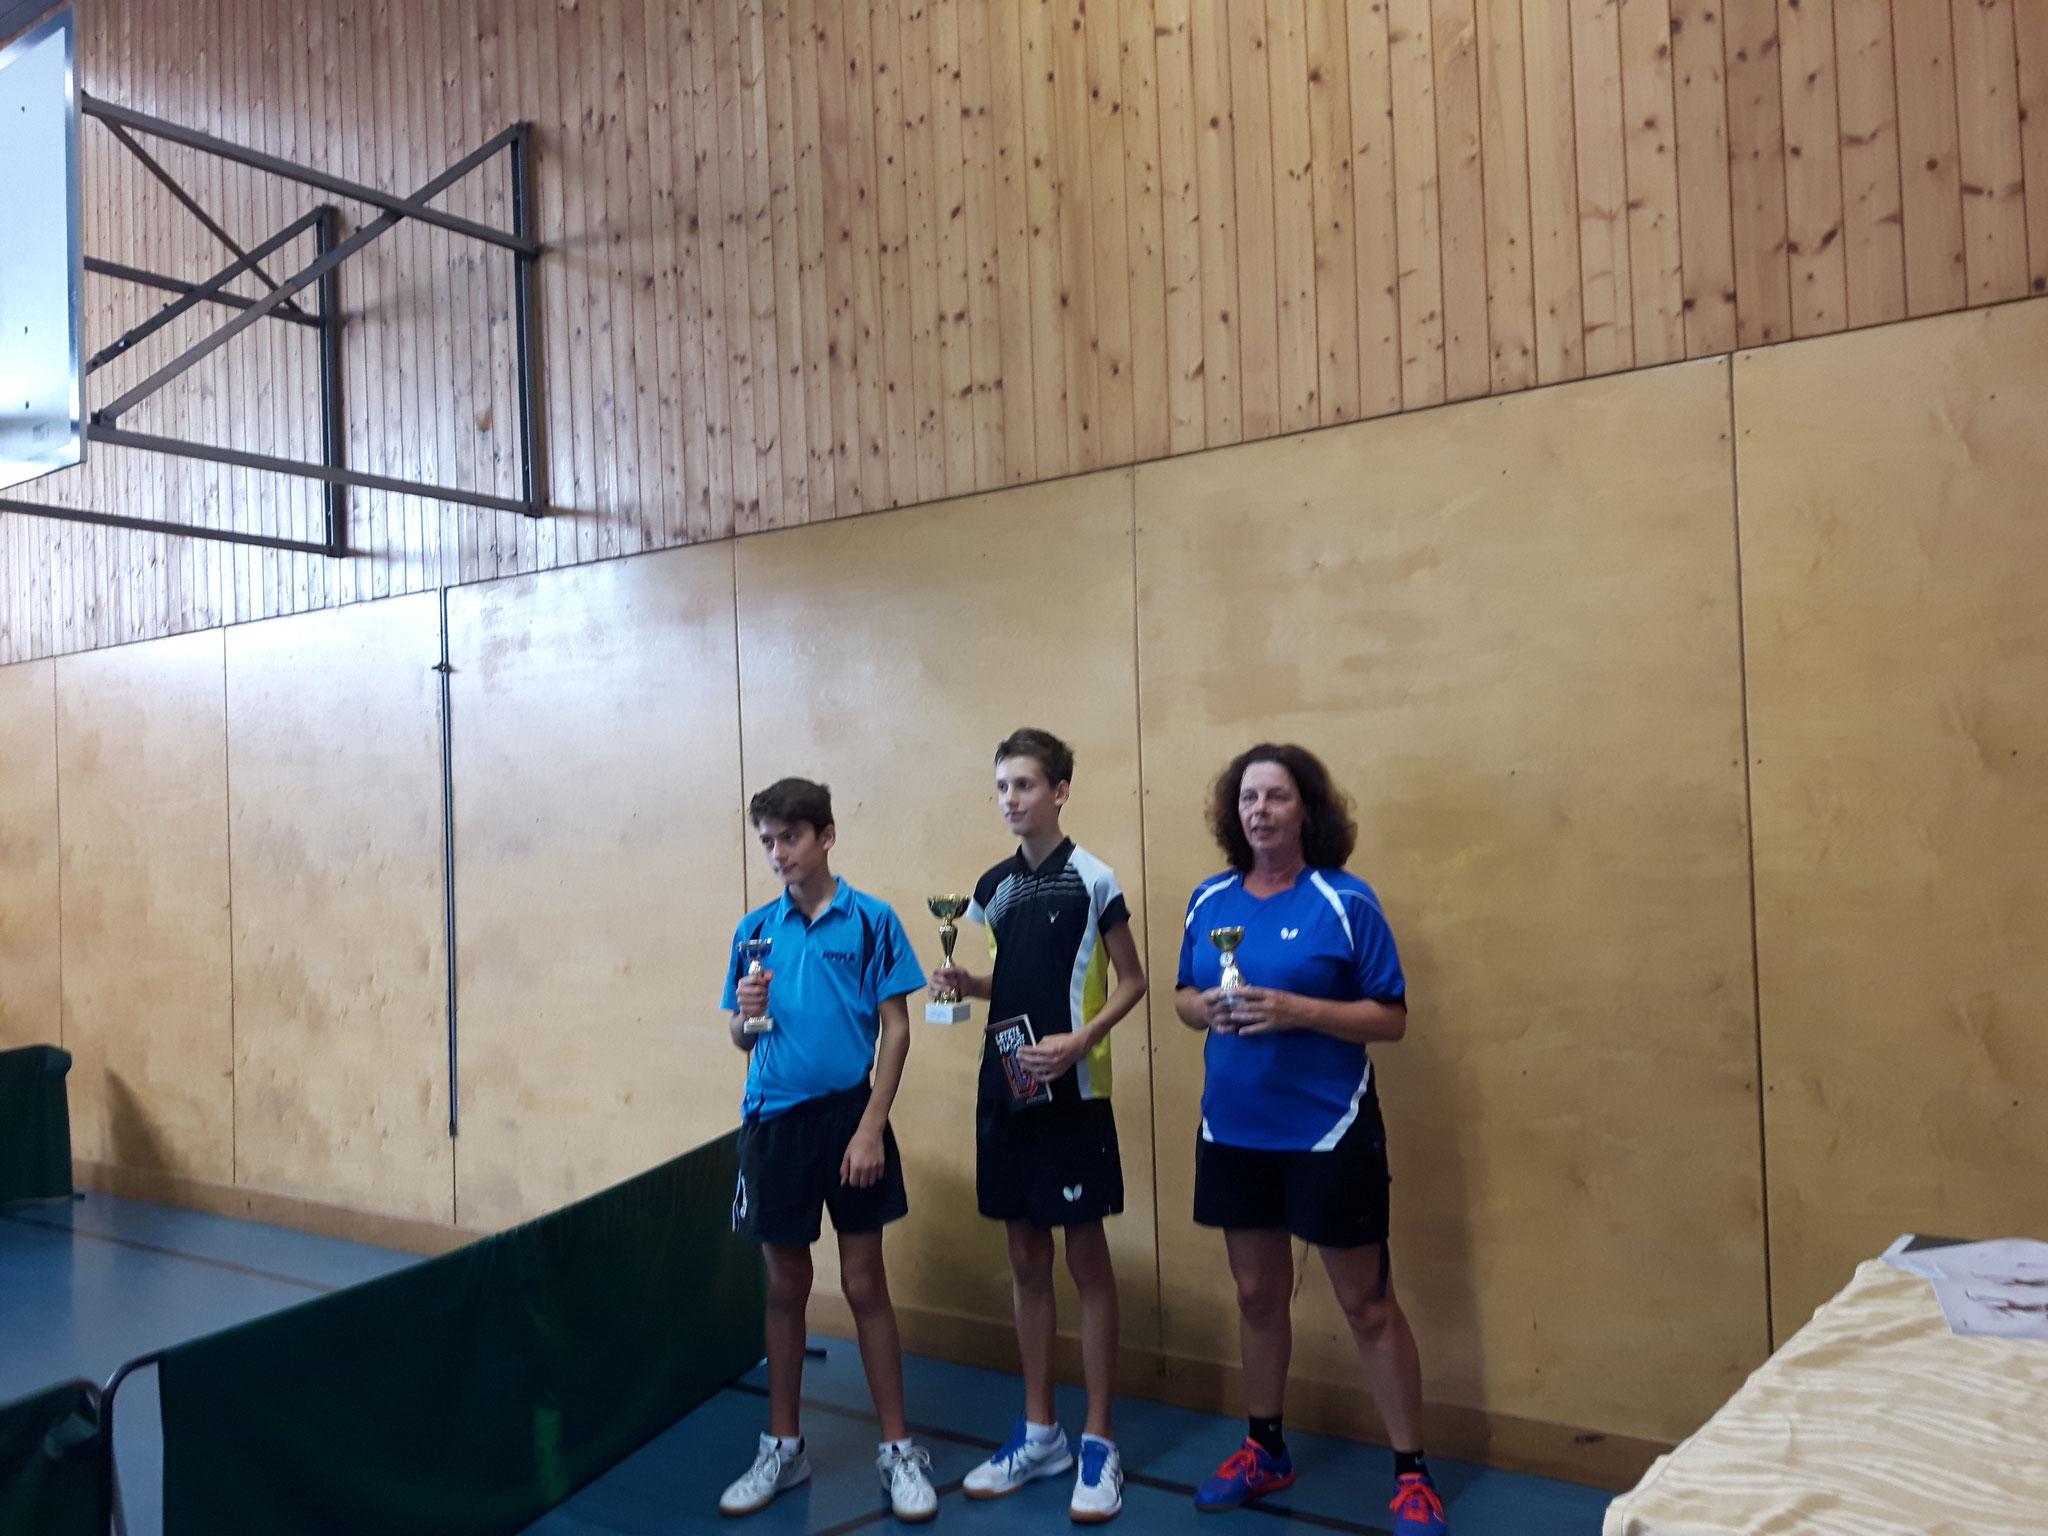 Siegerfoto Bewerb F: v.l.n.r. Stephan Wyss (FLÖT) (Platz 2), Fabian Kriha (SSTO) (Sieger), Roswitha Balogh (SSTO) (Platz 3)